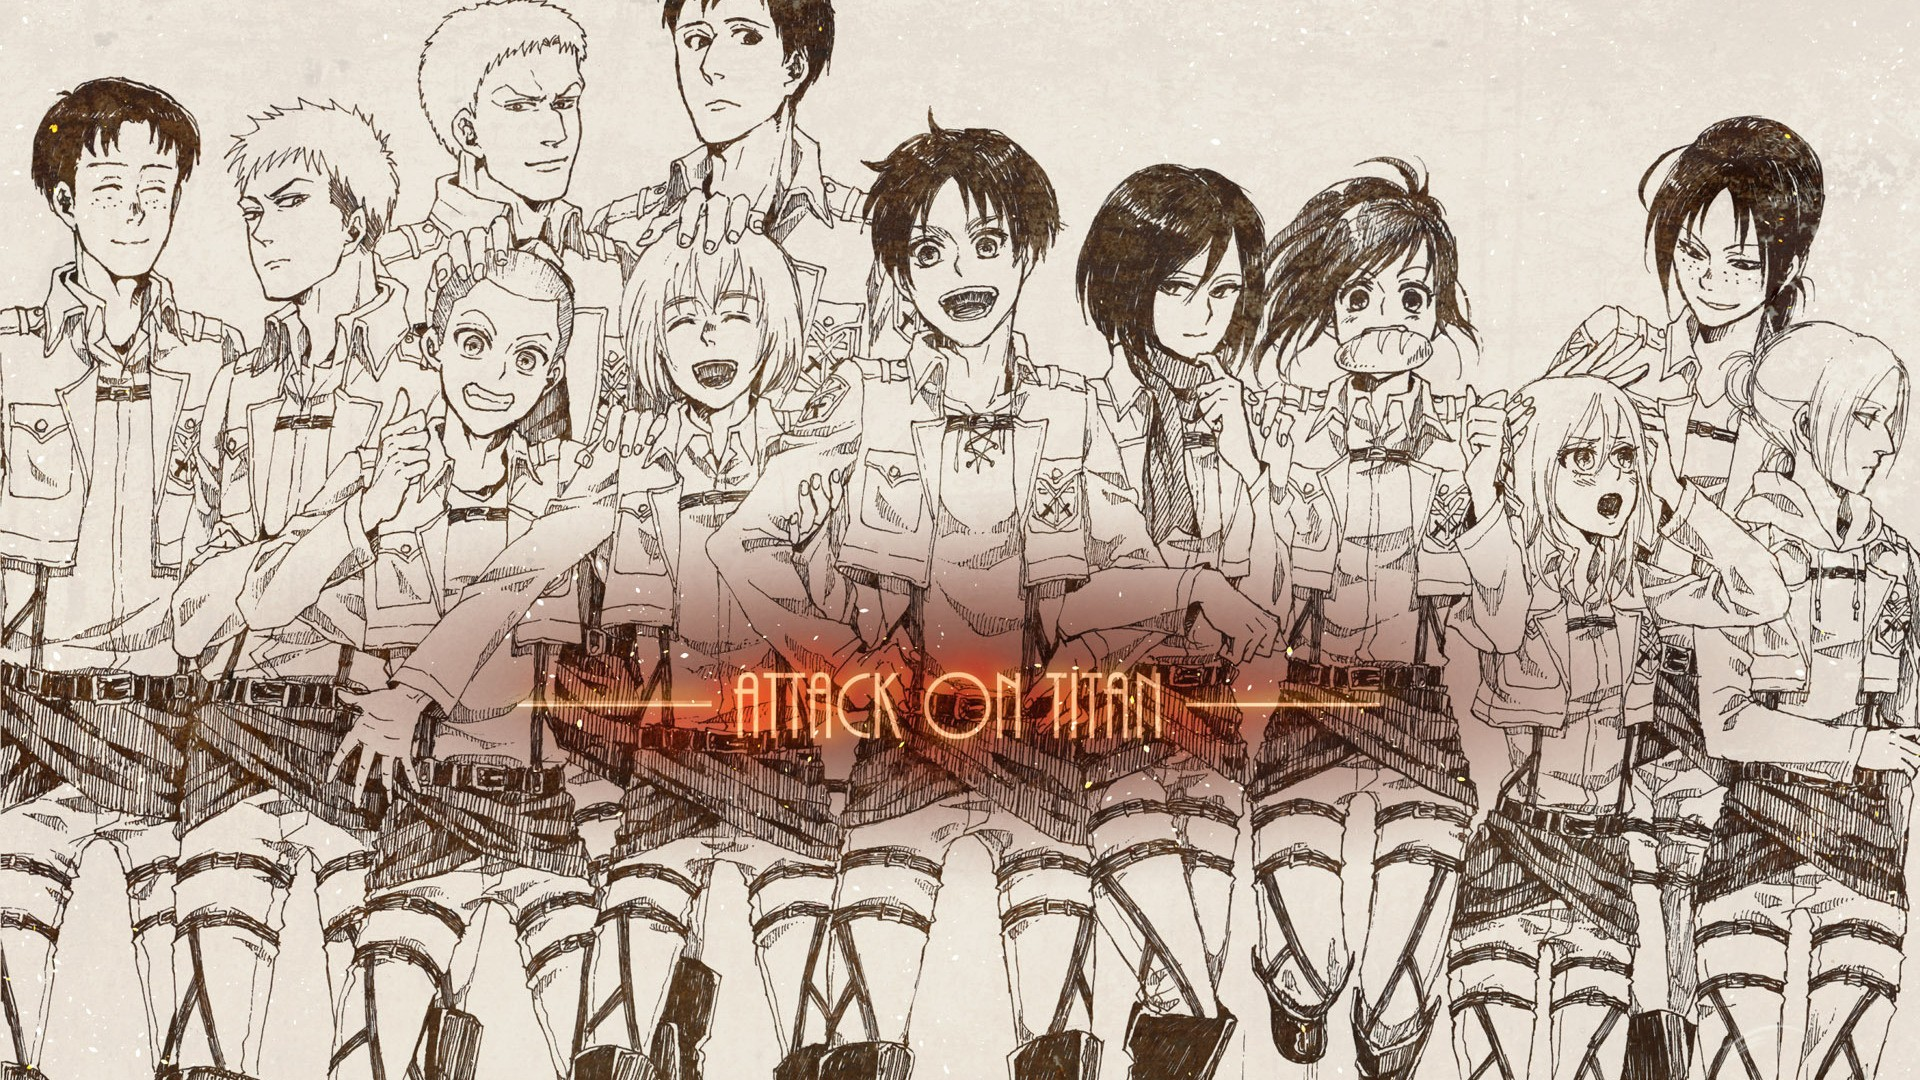 Anime 1920x1080 Shingeki no Kyojin Eren Jeager Mikasa Ackerman Armin Arlert Blouse Sasha anime